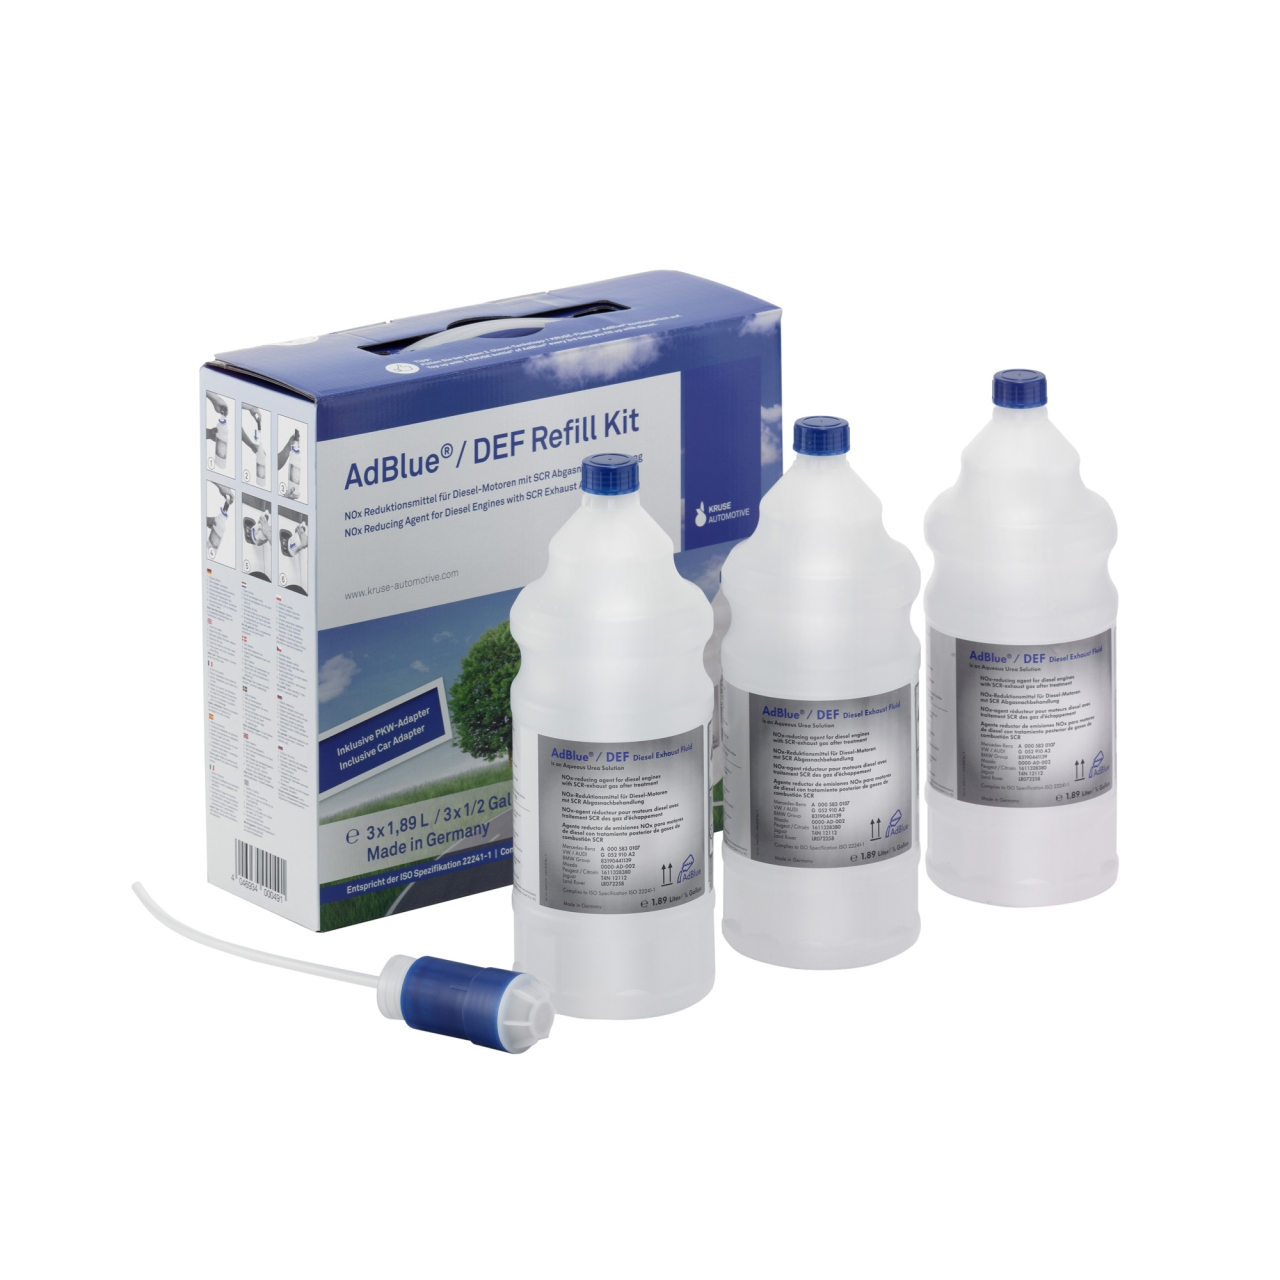 KRUSE Adblue Harnstofflösung Refill Kit 3 x 1,89 Liter für Pkw-Befüllung 1003803893500